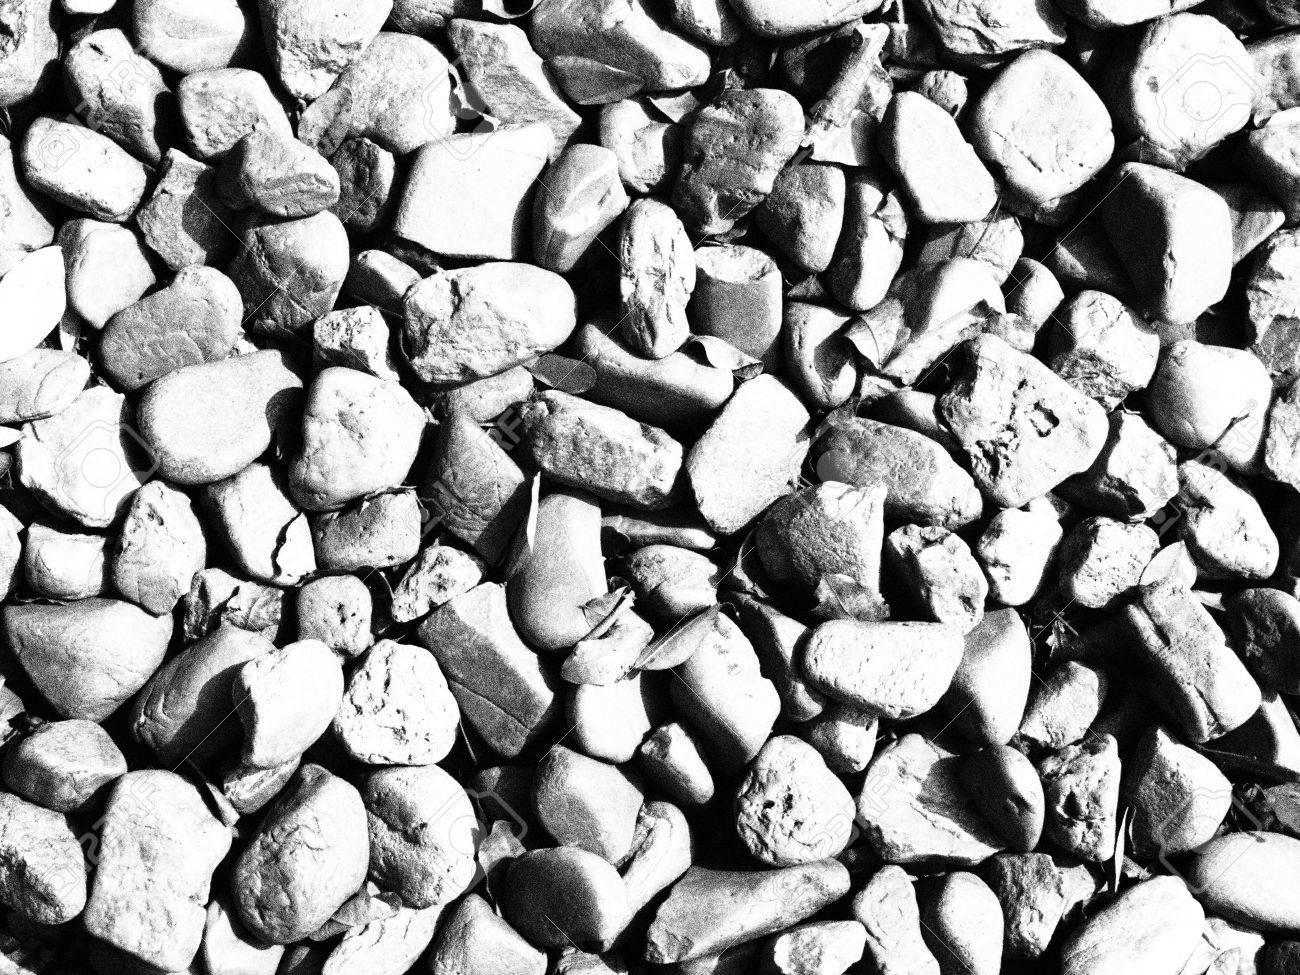 1300x975 Black And White Image Of Gravel Floor In Garden Stock Photo